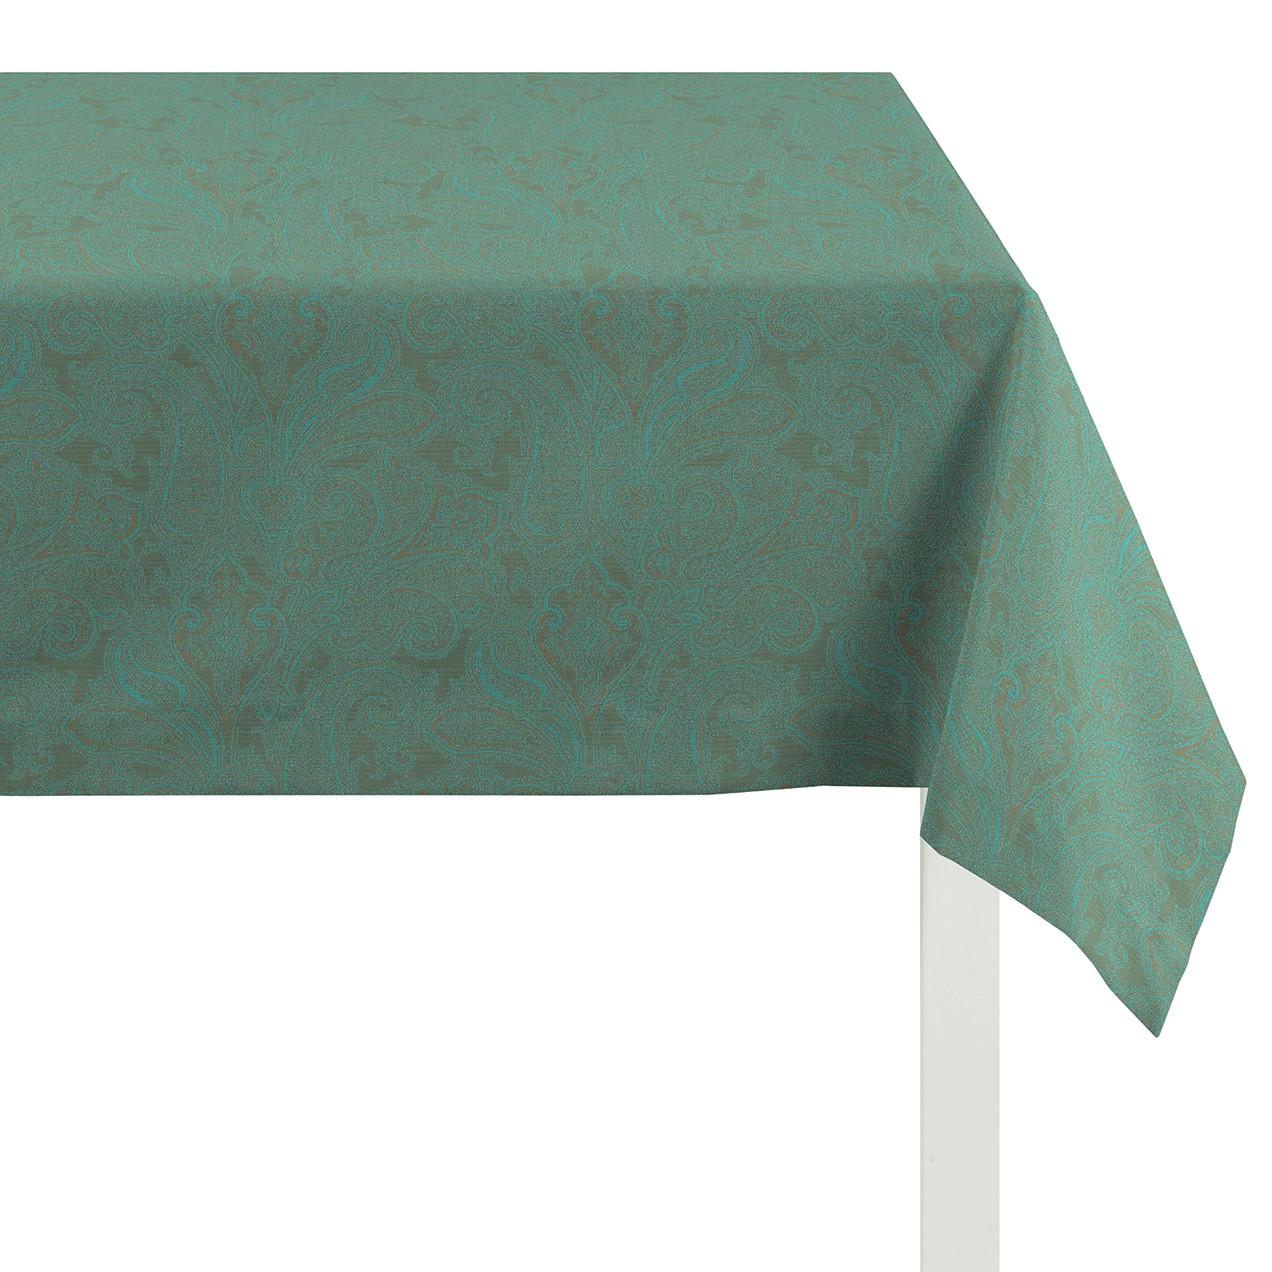 Tafelkleed Joseni - geweven stof - Turquoise Green - 100x100cm, Apelt